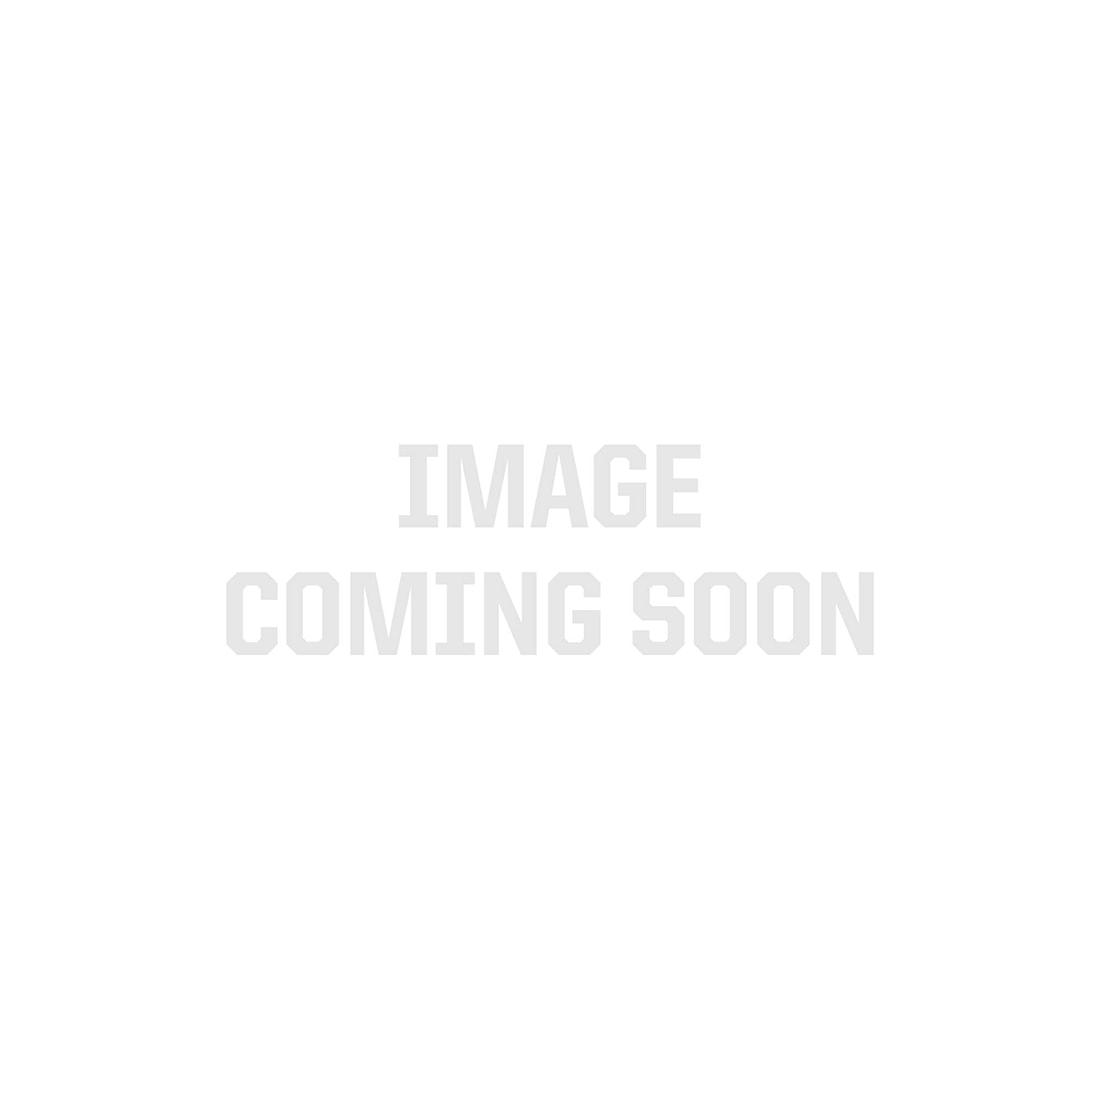 Neutral White 2835 Single Row CurrentControl LED Strip Light, 120/m, 10mm wide, Sample Kit